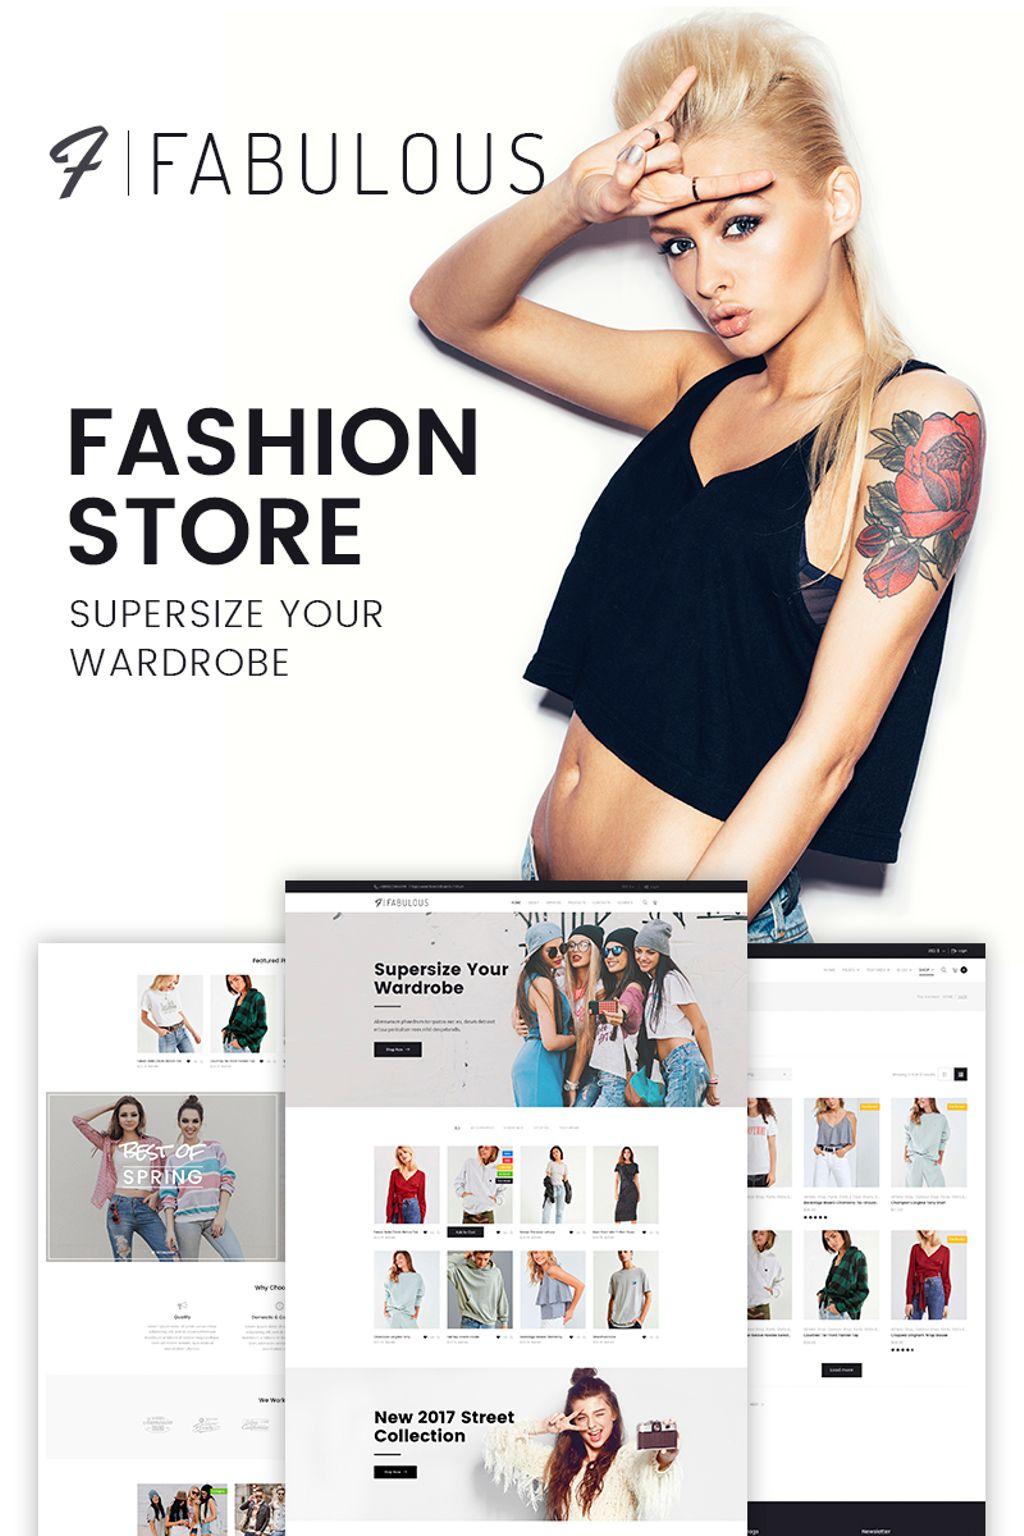 Fashion store templates templatemonster fabulous fashion store pronofoot35fo Choice Image